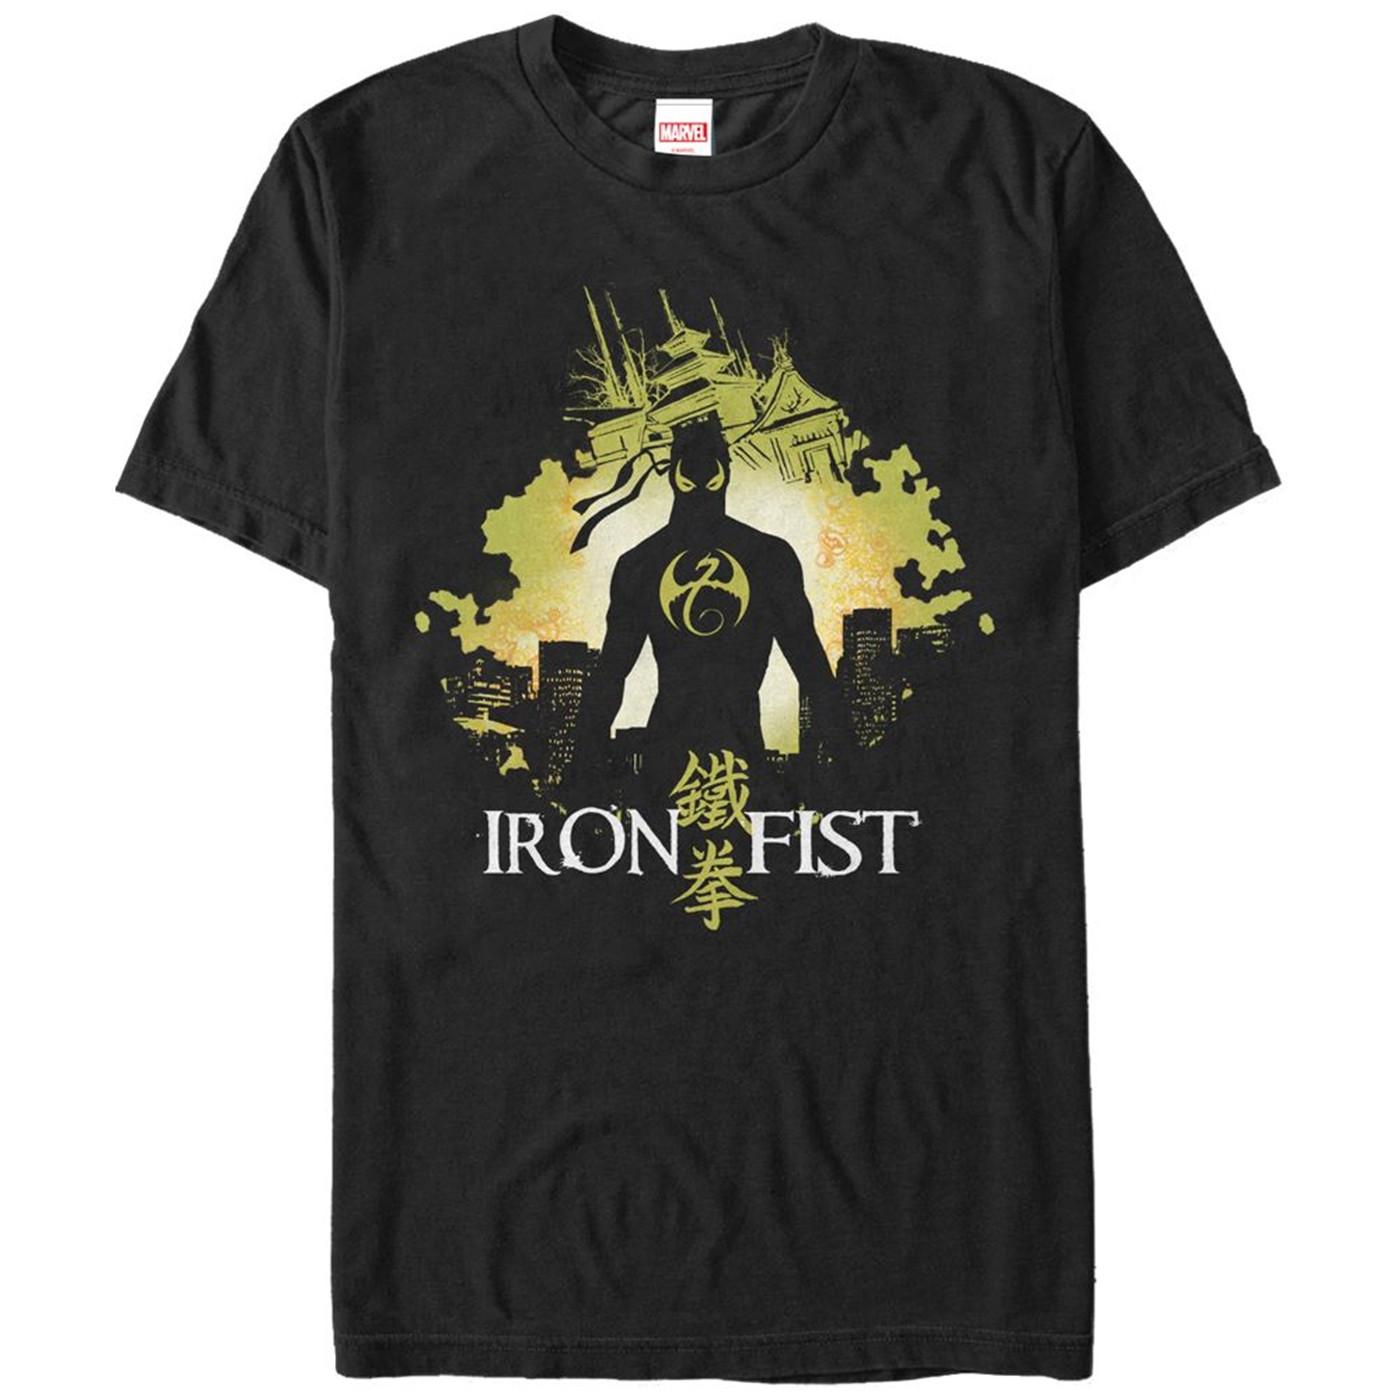 Iron Fist Cityscape Men's T-Shirt